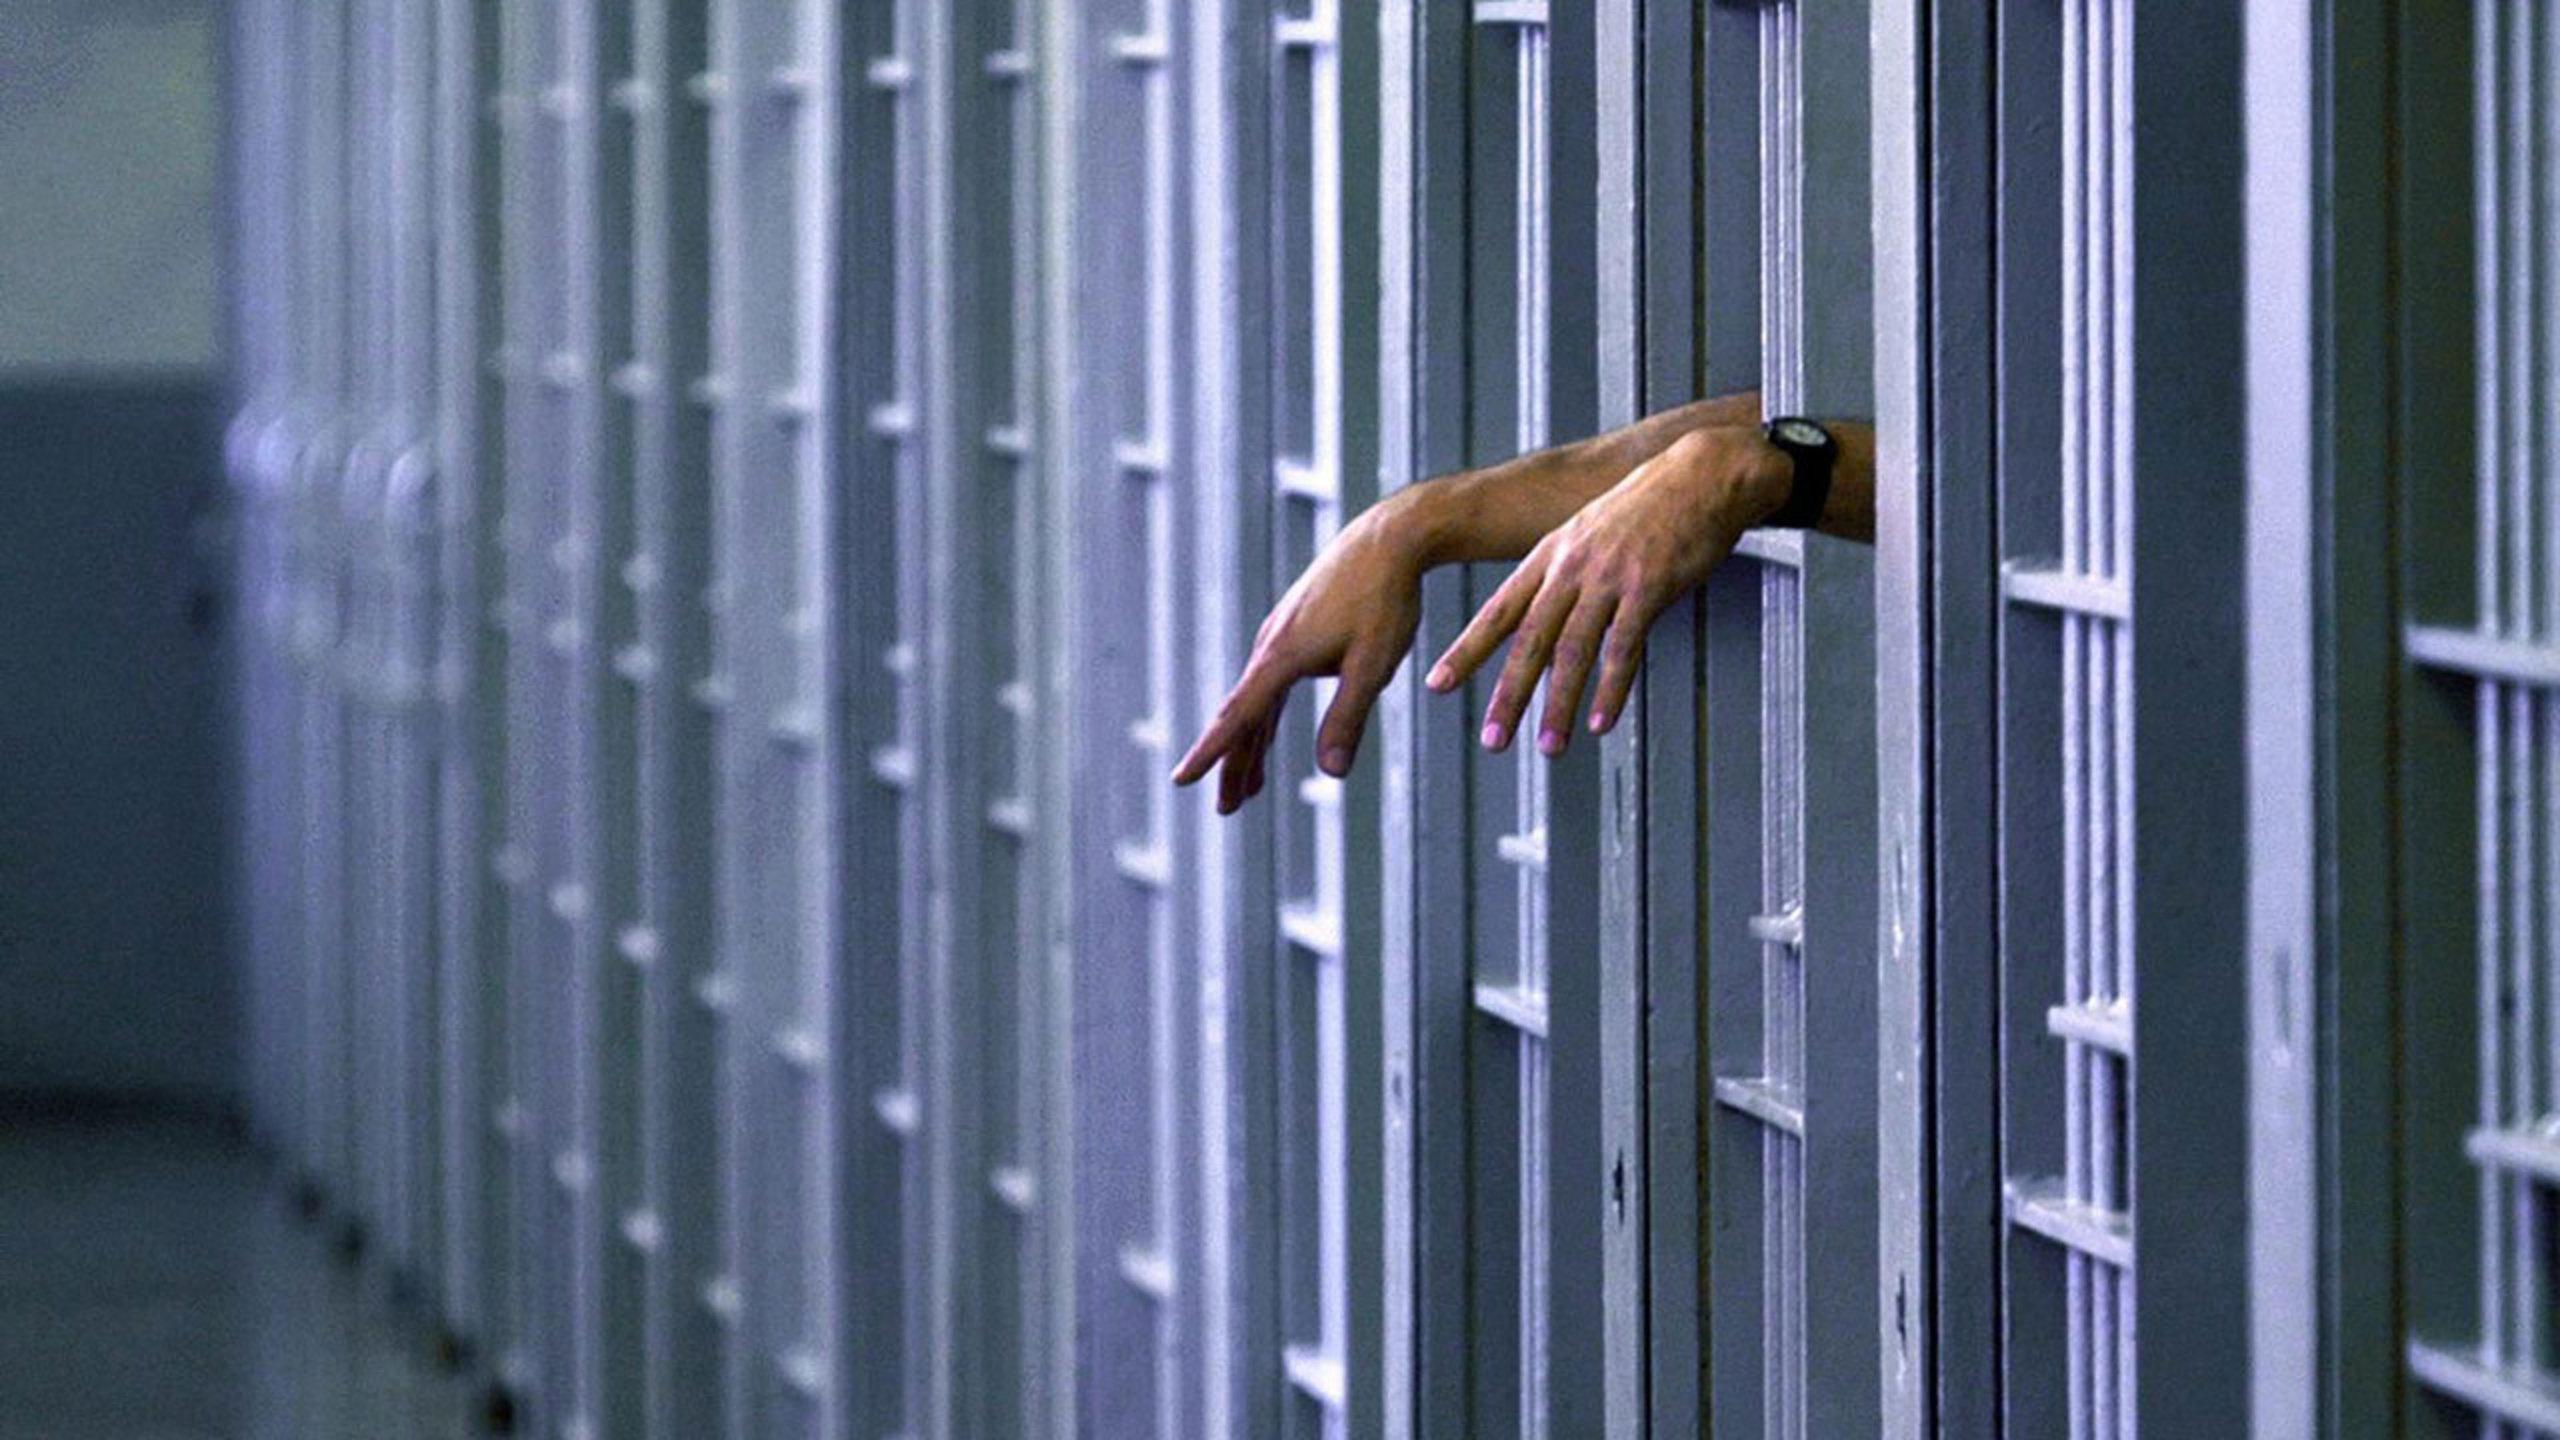 Audit: California prison program illegally spent $1.3M - Los Angeles Sentinel